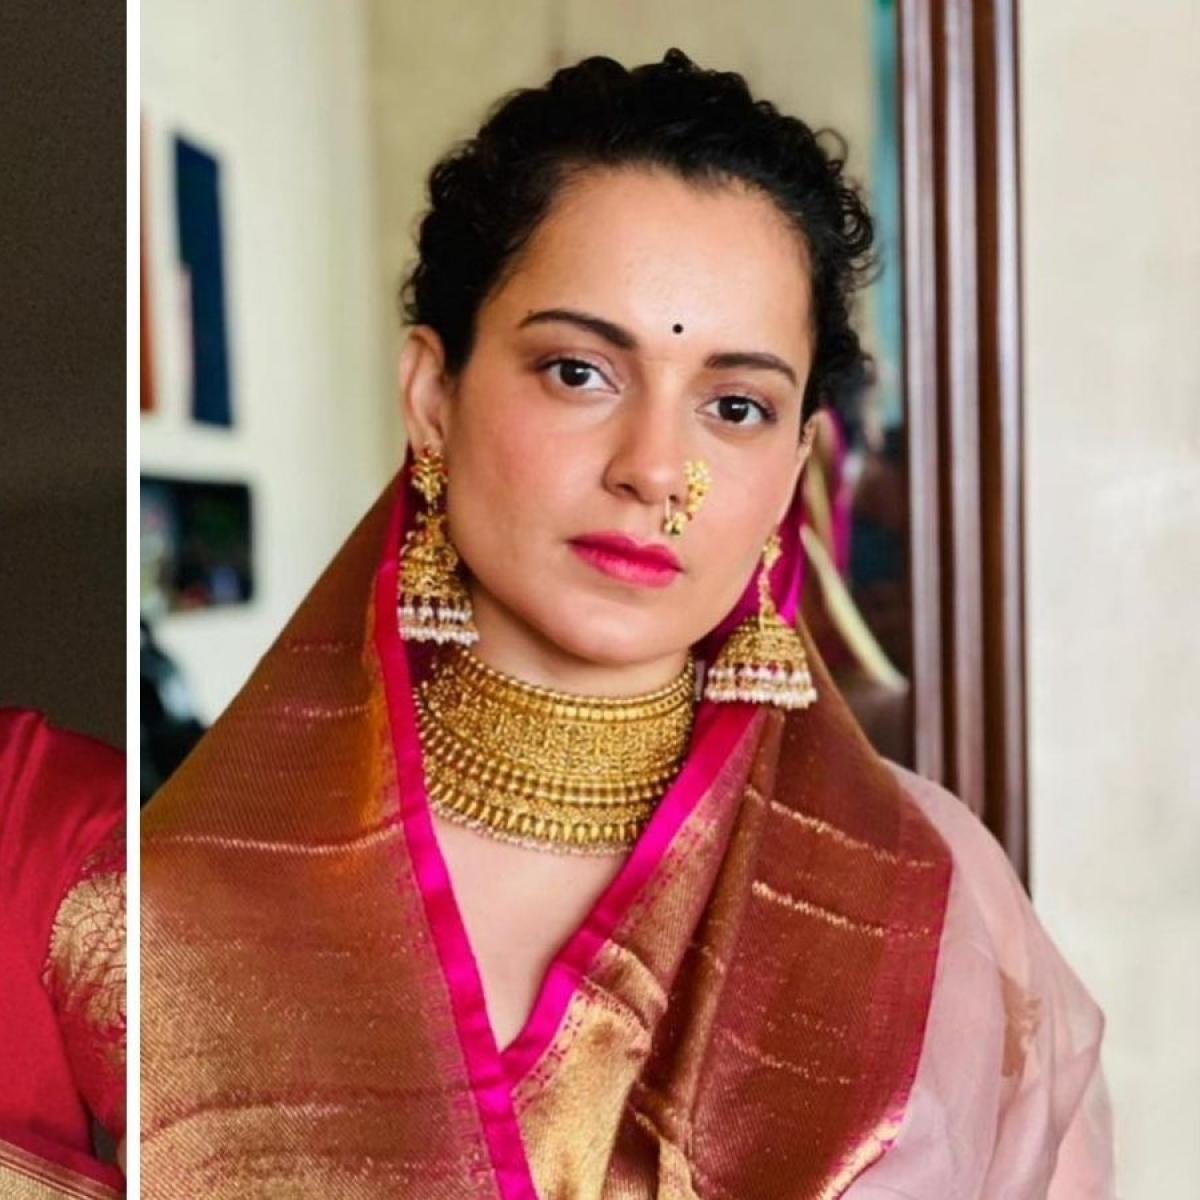 From Bhumi Pednekar to Kangana Ranaut, B-Town celebs extend Navratri, Gudi Padwa 2021 wishes